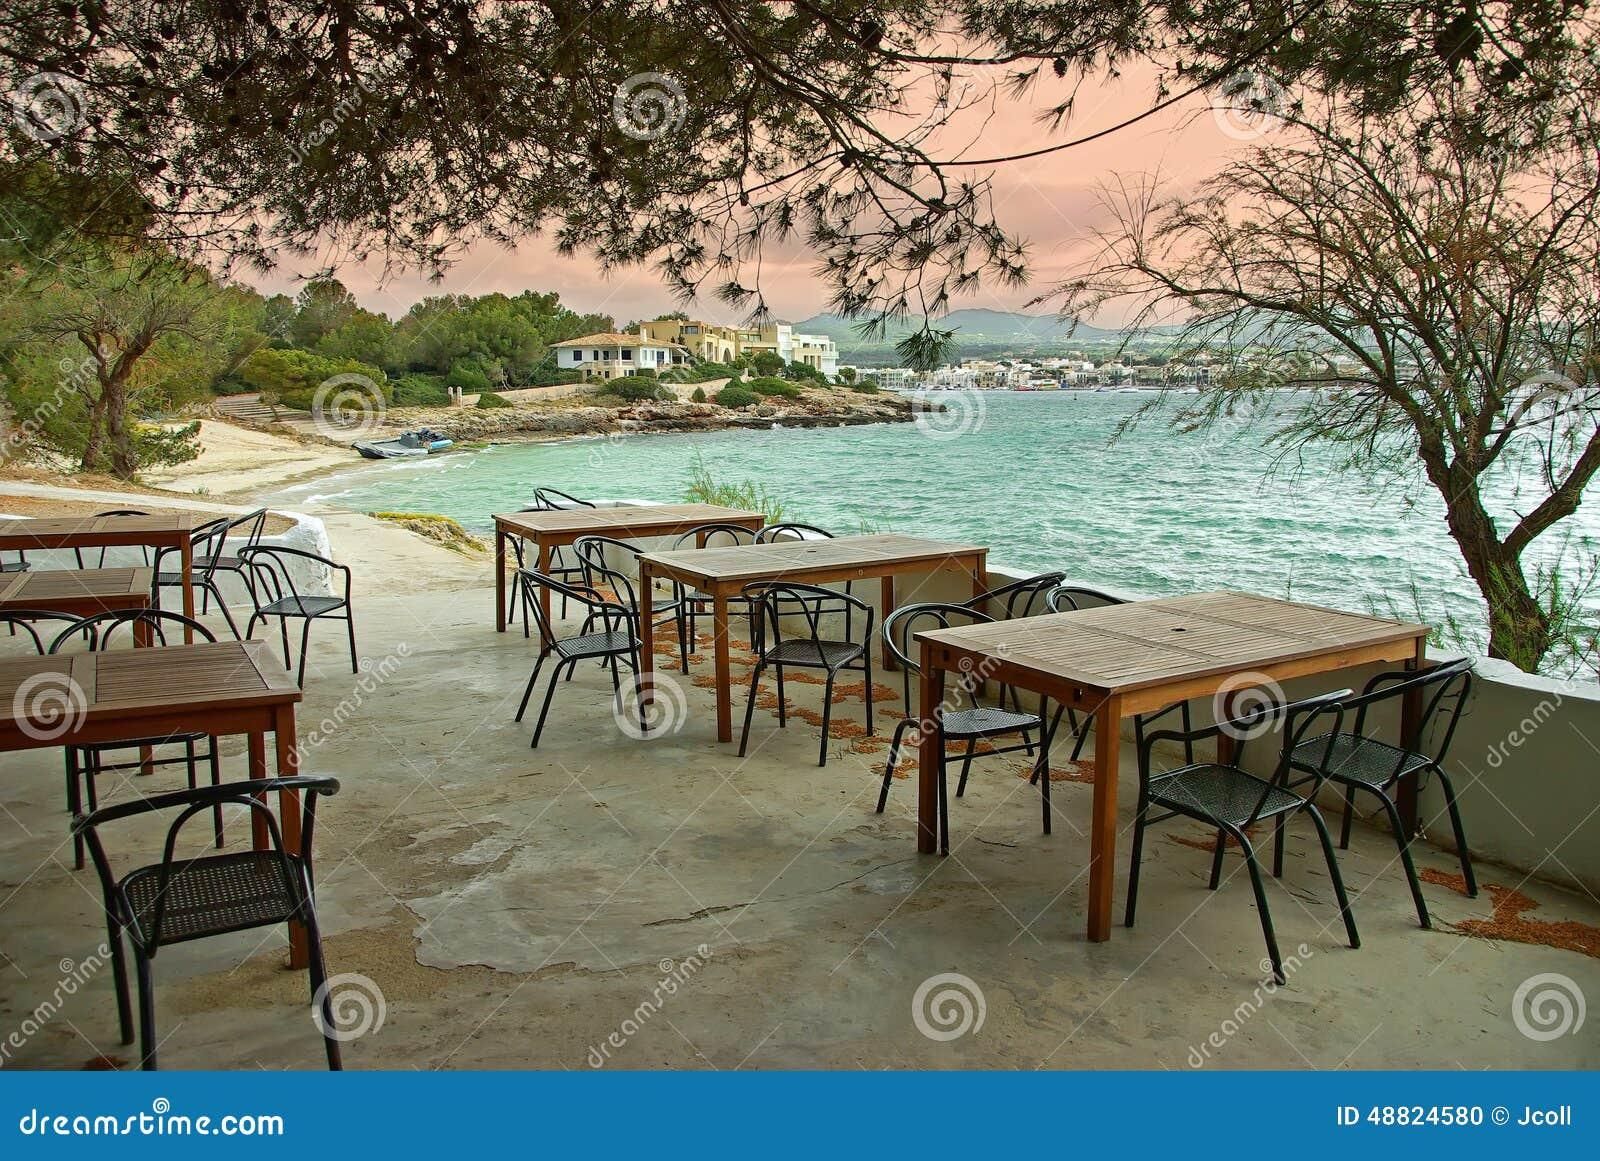 coucher du soleil dans une terrasse m diterran enne photo stock image 48824580. Black Bedroom Furniture Sets. Home Design Ideas